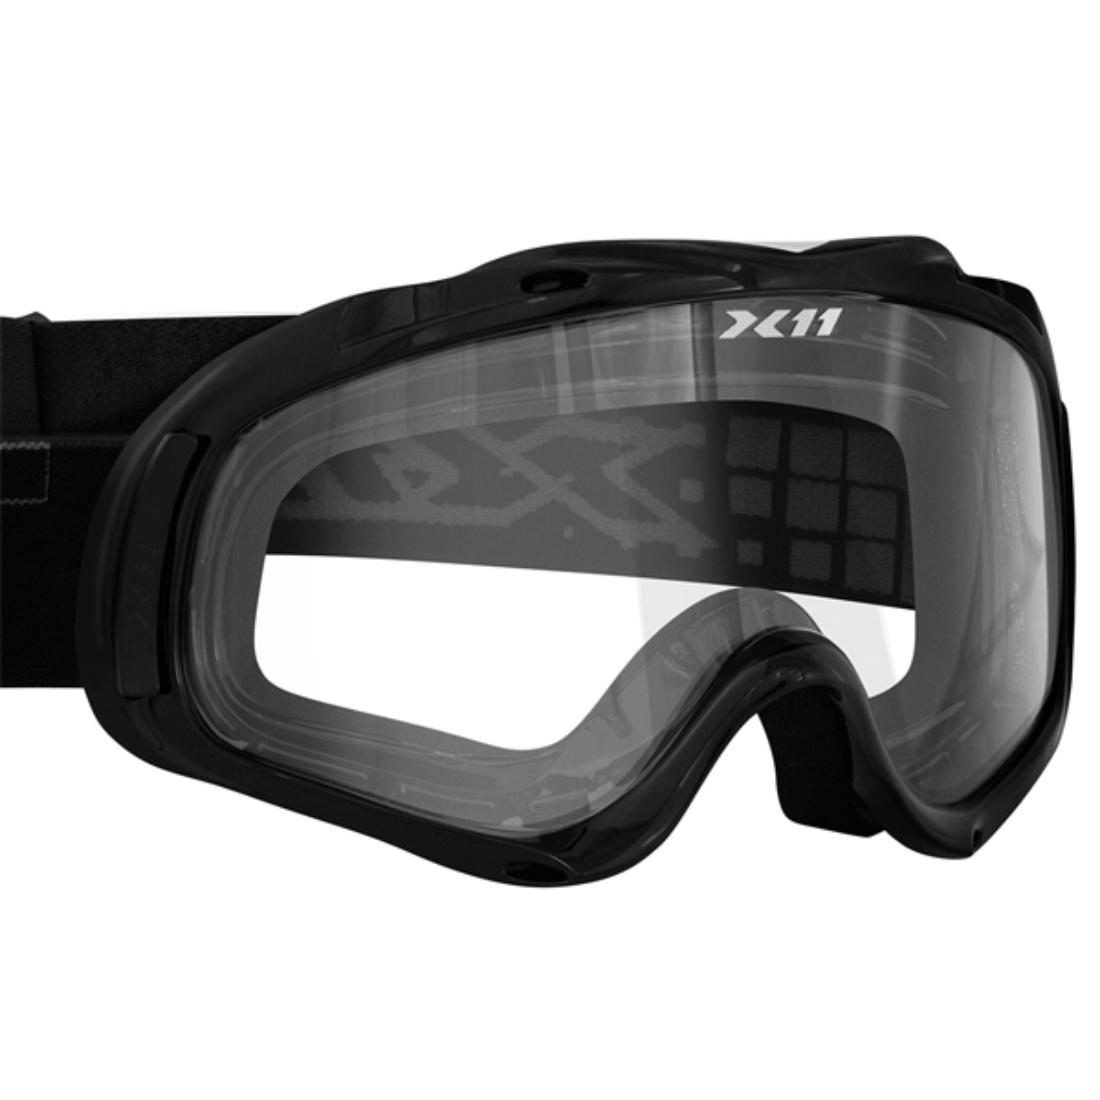 Óculos X11 Mx Ramp Motocross Moto Off Road Trilha